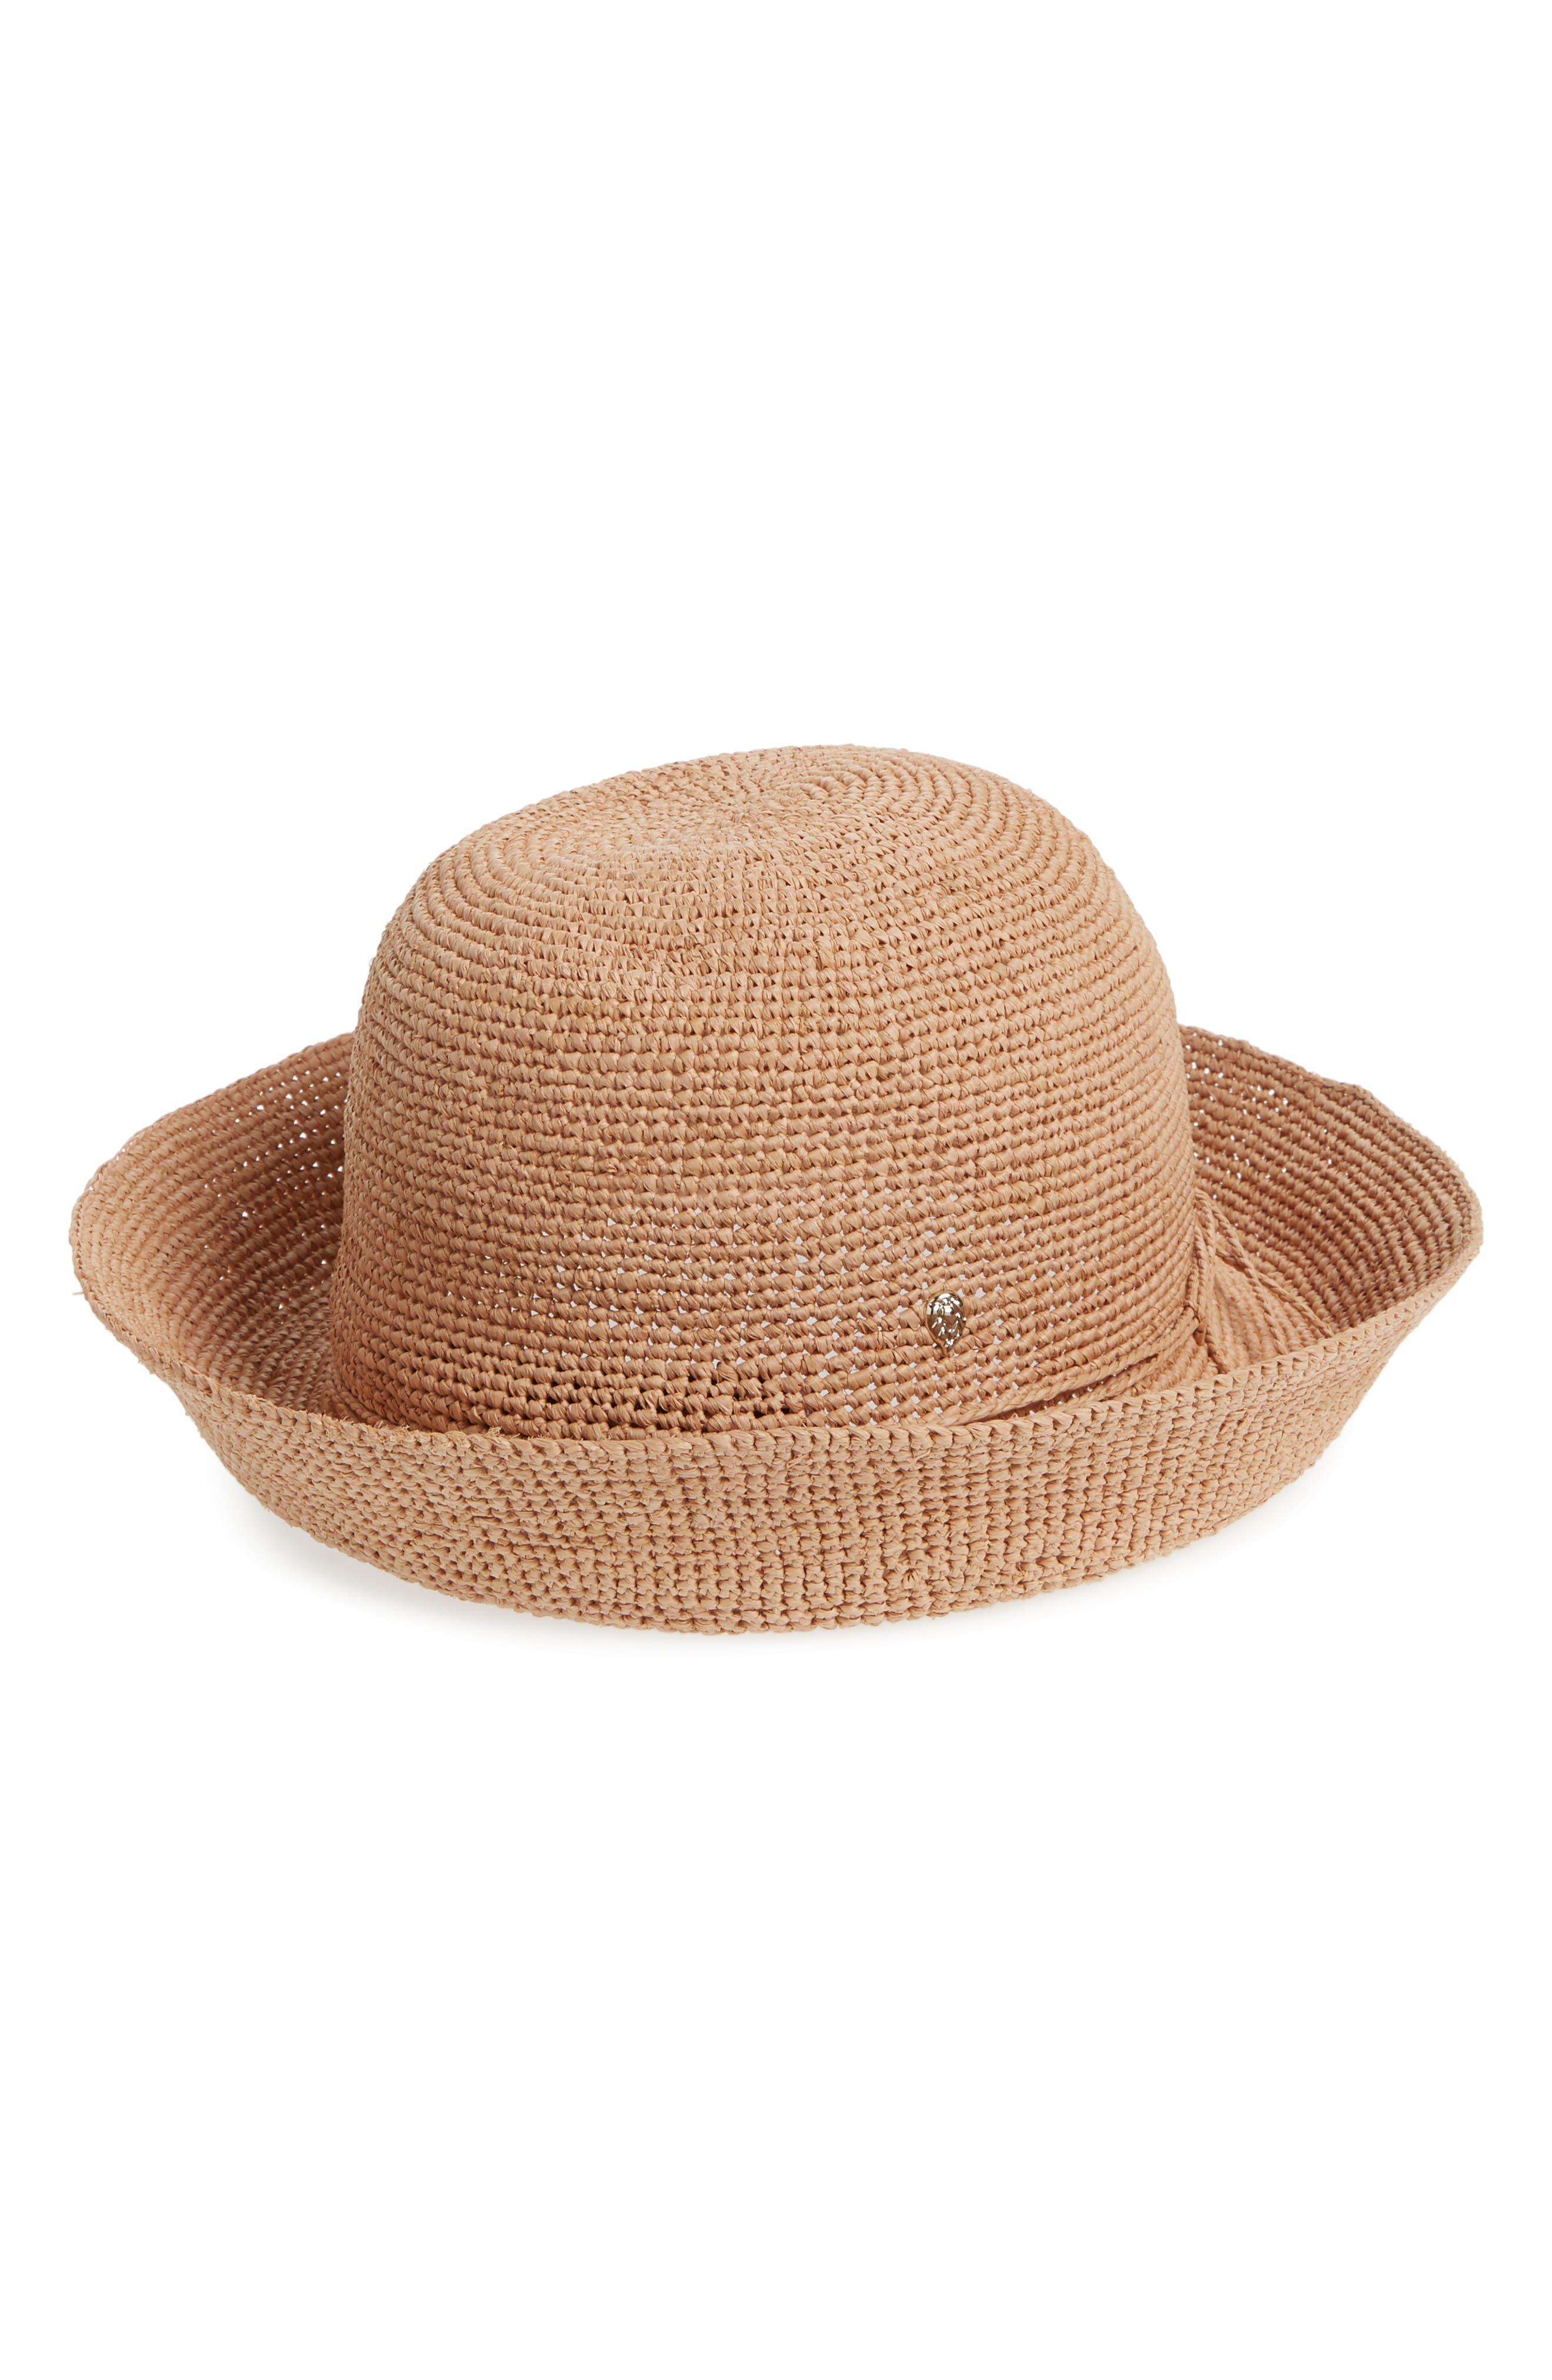 HELEN KAMINSKI CLASSIC UPTURN CROCHETED RAFFIA HAT - BROWN